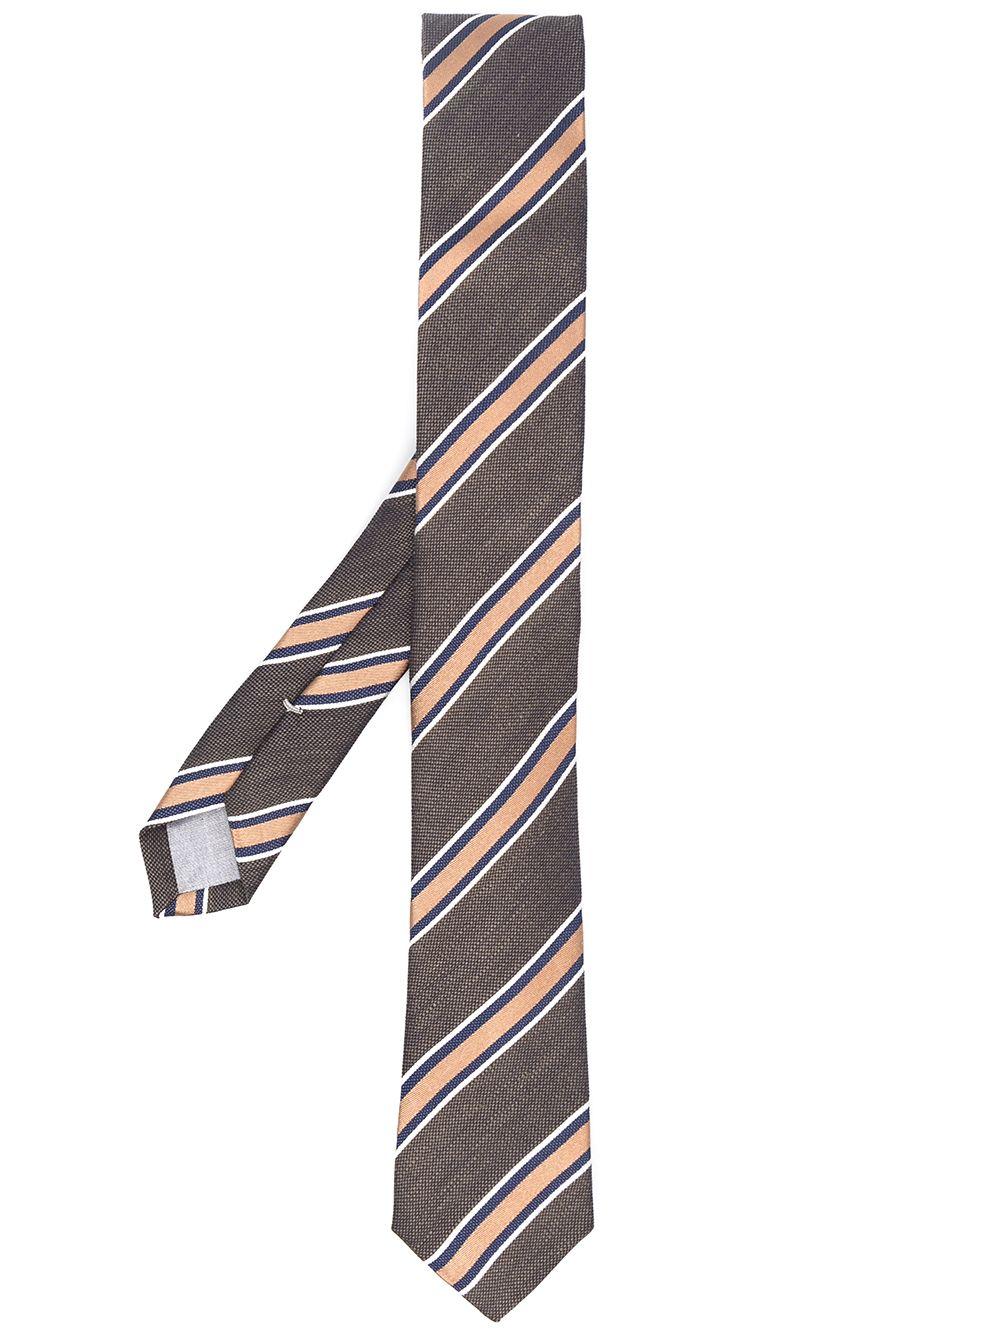 Cravatta a righe diagonali in seta verde e rosa ELEVENTY | Cravatte | C77CRAA01-CRA0C03107